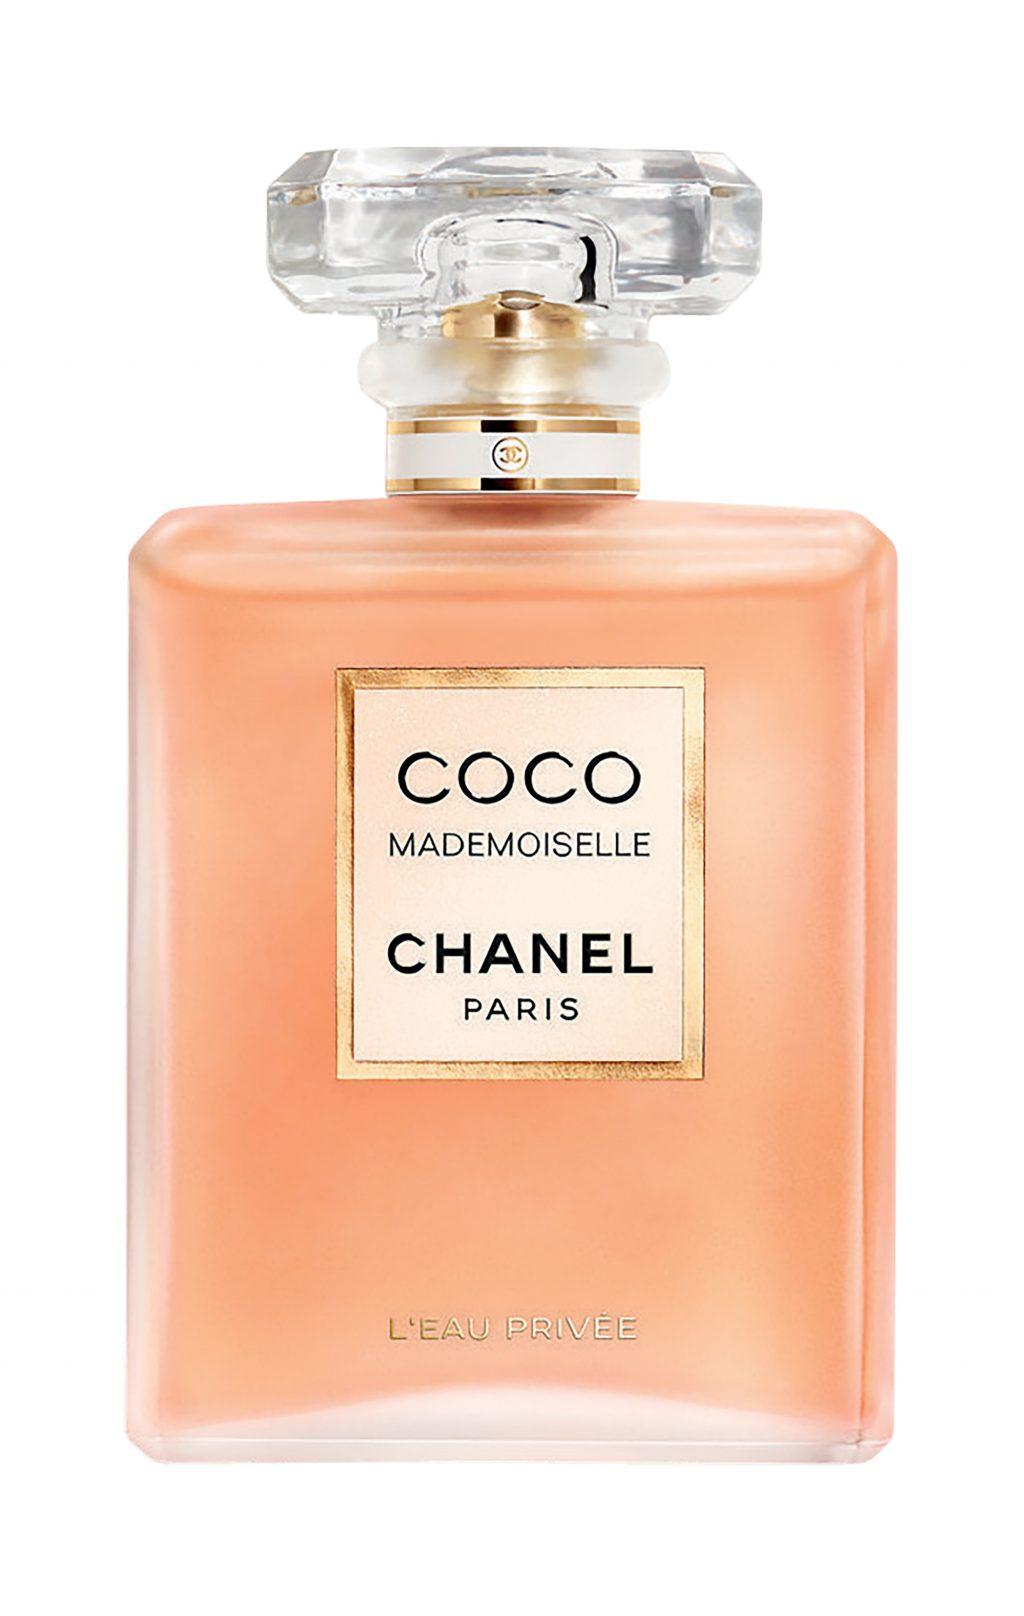 mùi hương Coco Mademoiselle Chanel